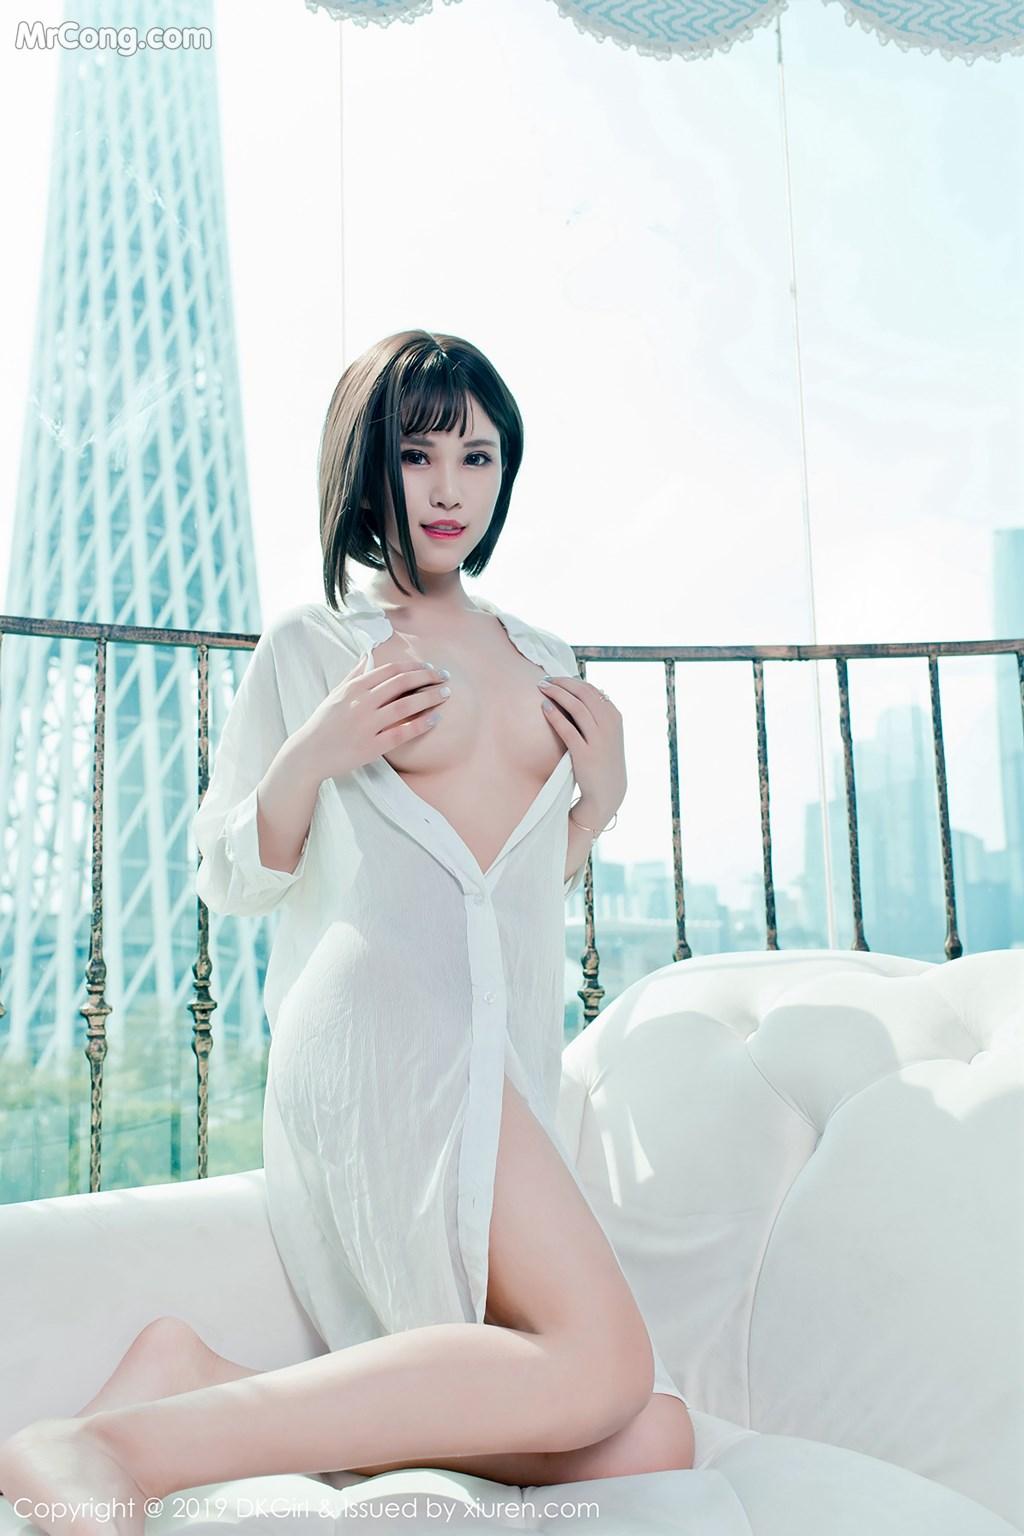 Image DKGirl-Vol.094-Meng-Bao-Er-BoA-MrCong.com-010 in post DKGirl Vol.094: Người mẫu Meng Bao Er (萌宝儿BoA) (48 ảnh)